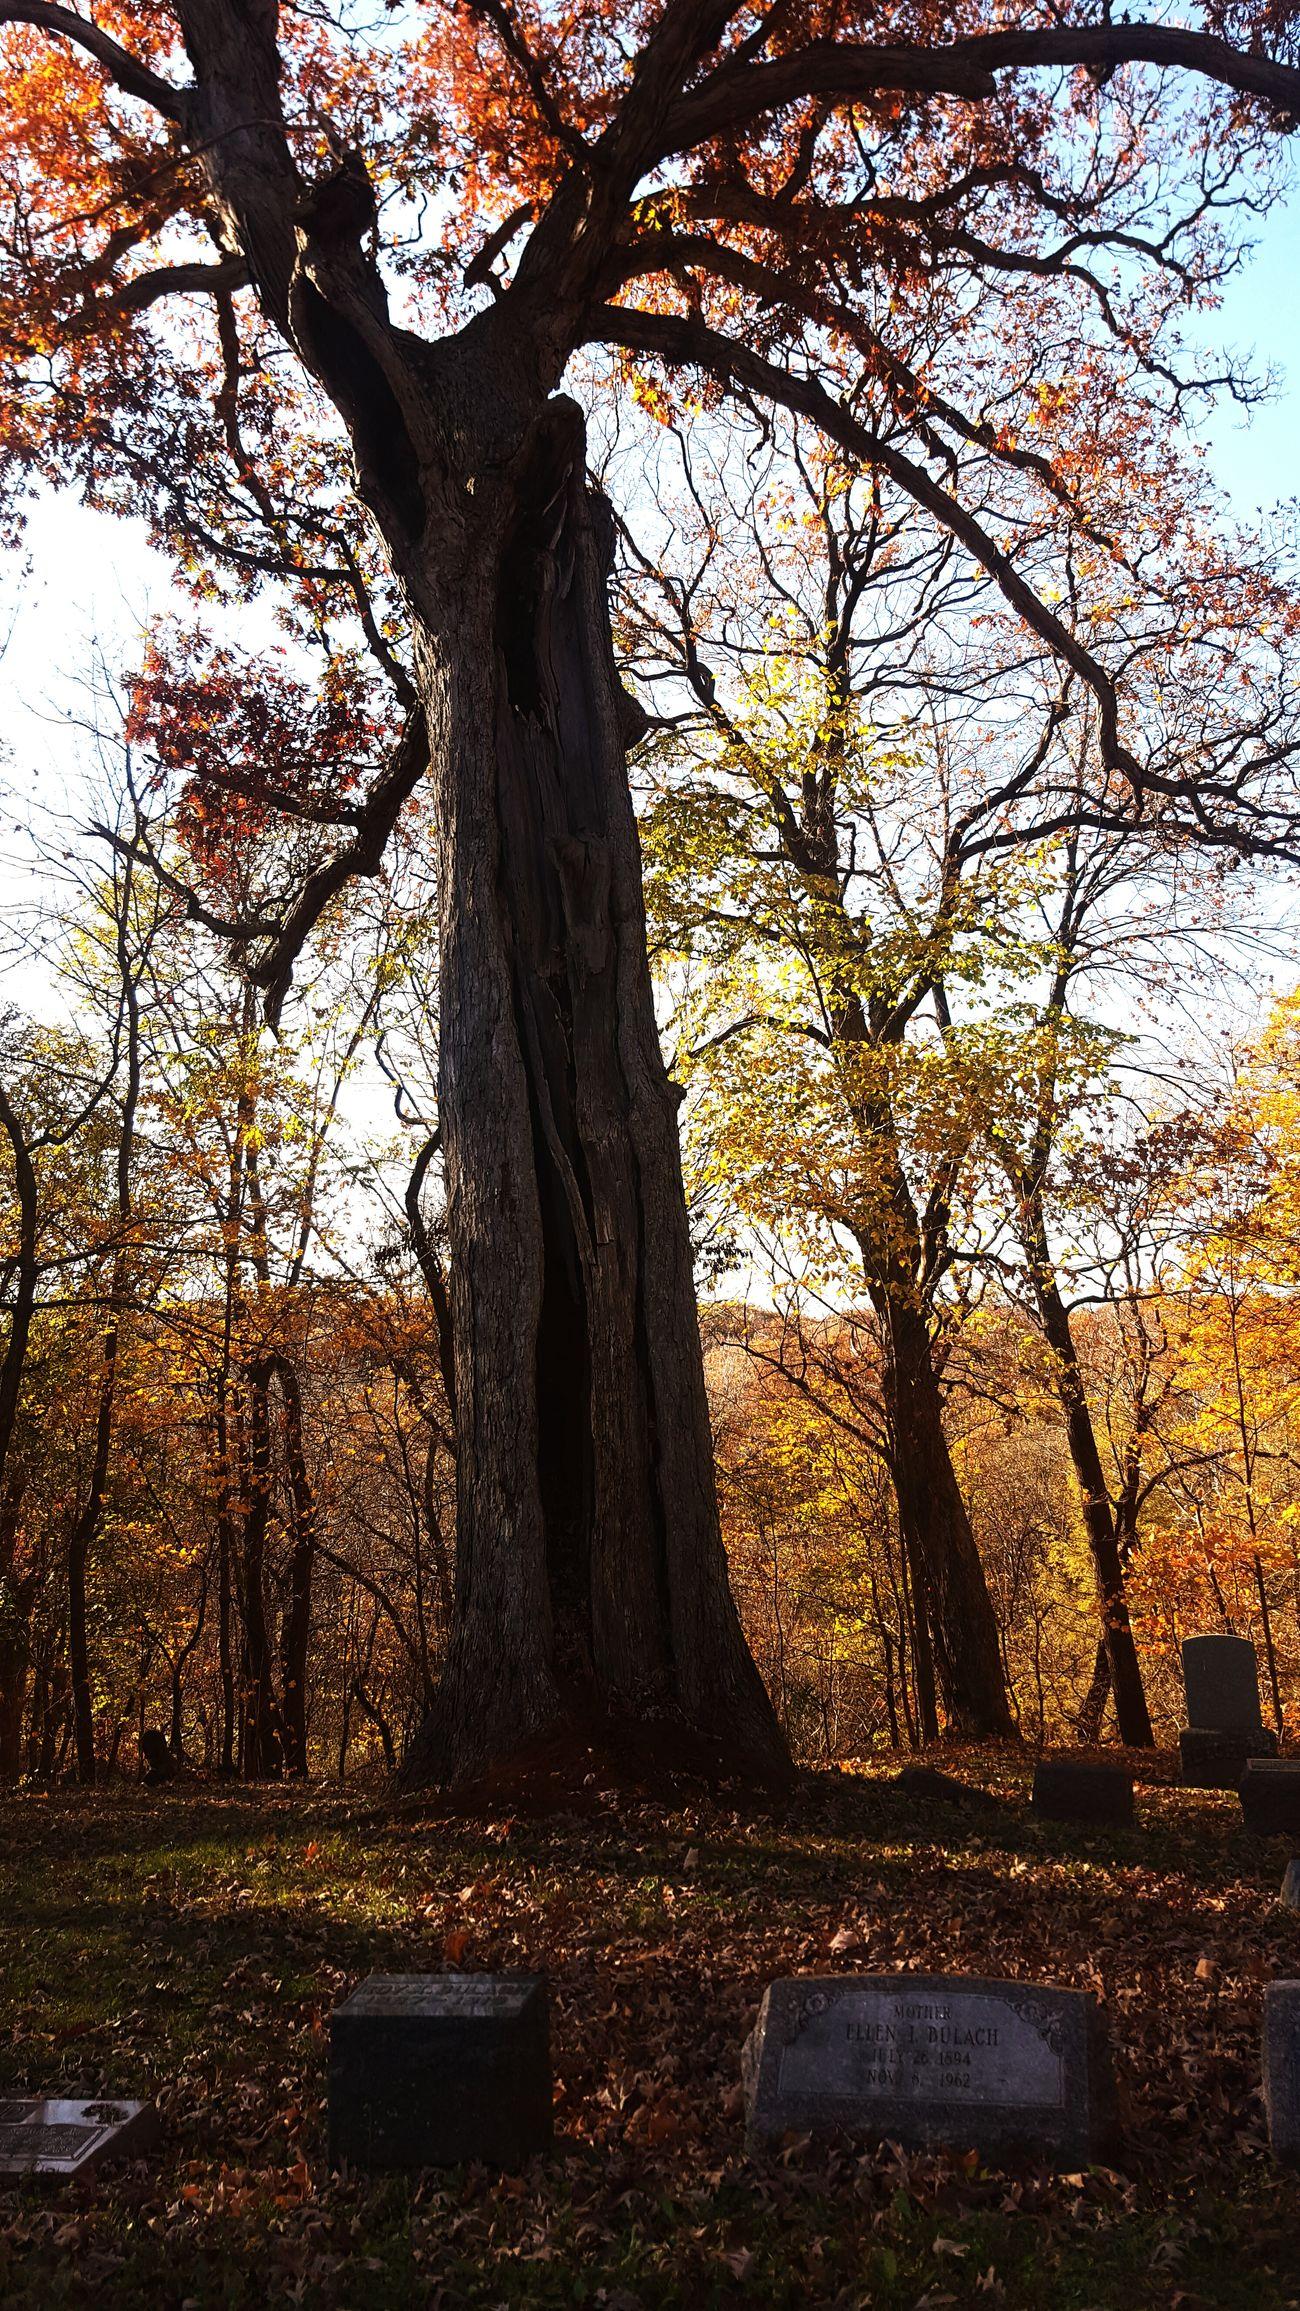 Autumnal Bliss Cemetary Beauty Fall Days